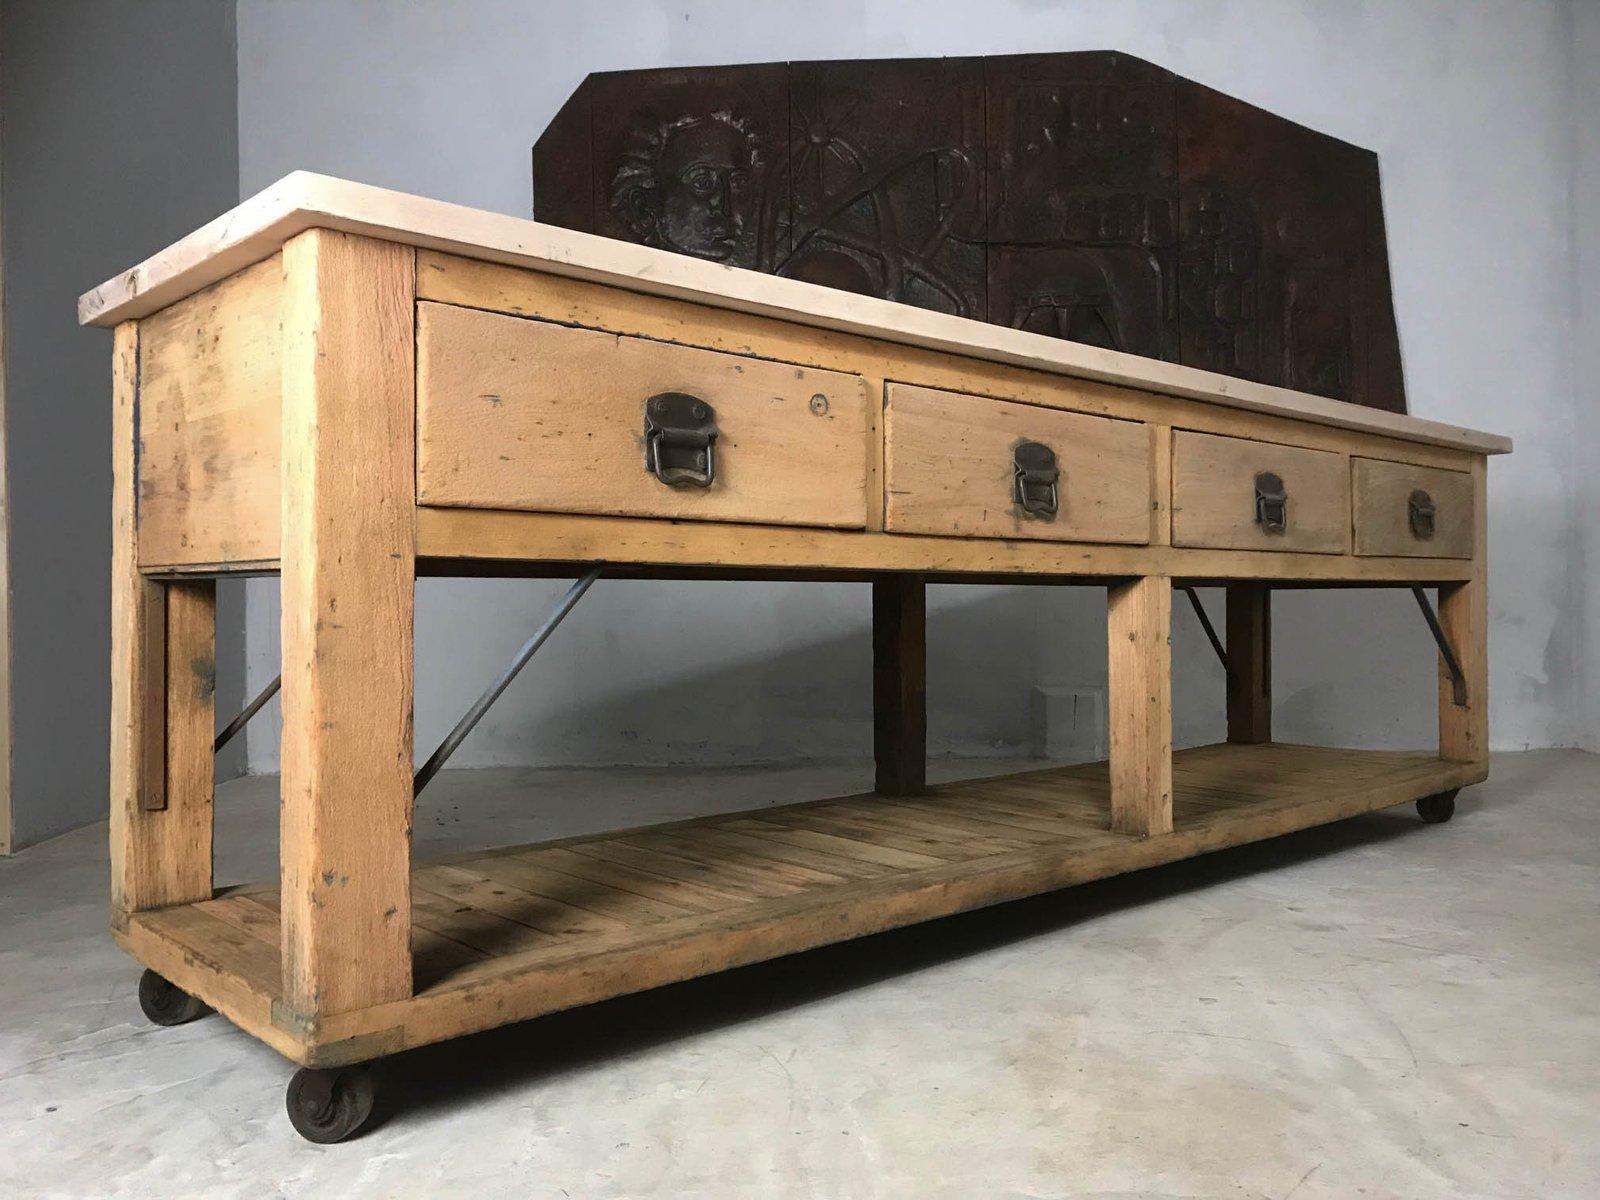 Credenza Vintage Da Cucina : Credenza da cucina o tavolo fornaio vintage in legno diof